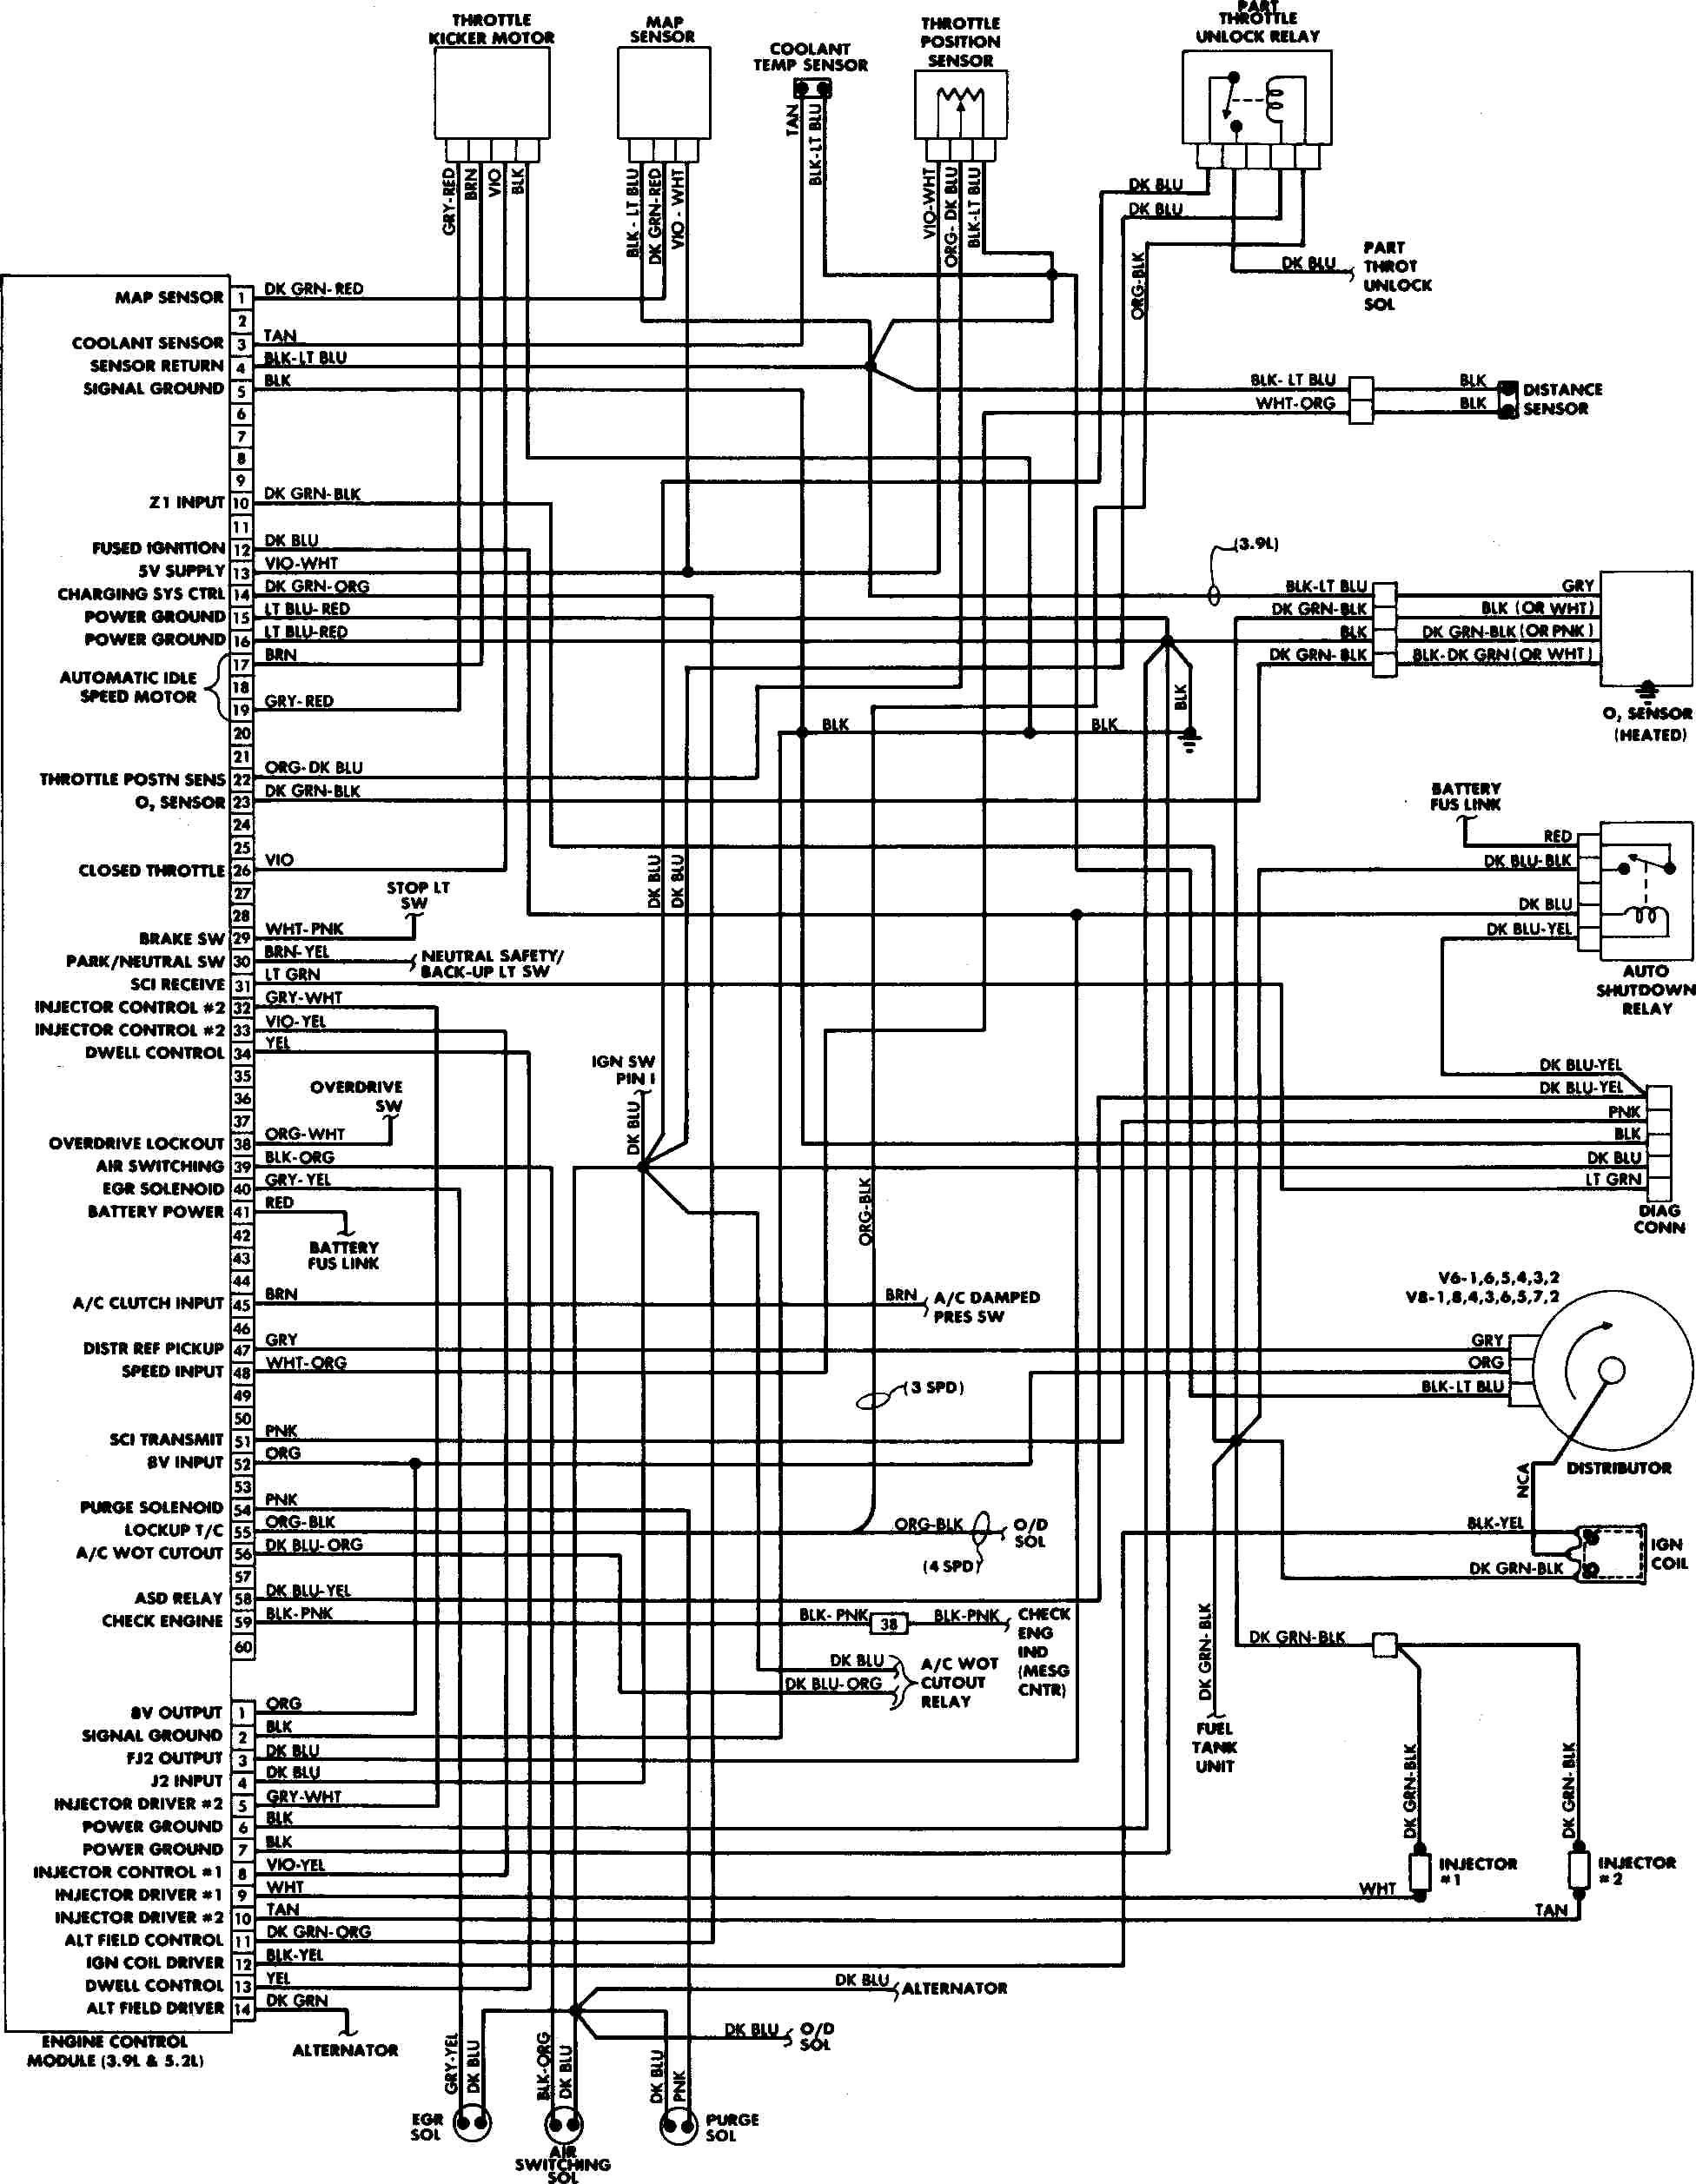 1998 Dodge Ram 1500 Tail Light Wiring Diagram 1998 Dodge Ram 1500 Ignition Wiring Diagram Valid 1994 Best Dakota Of 1998 Dodge Ram 1500 Tail Light Wiring Diagram